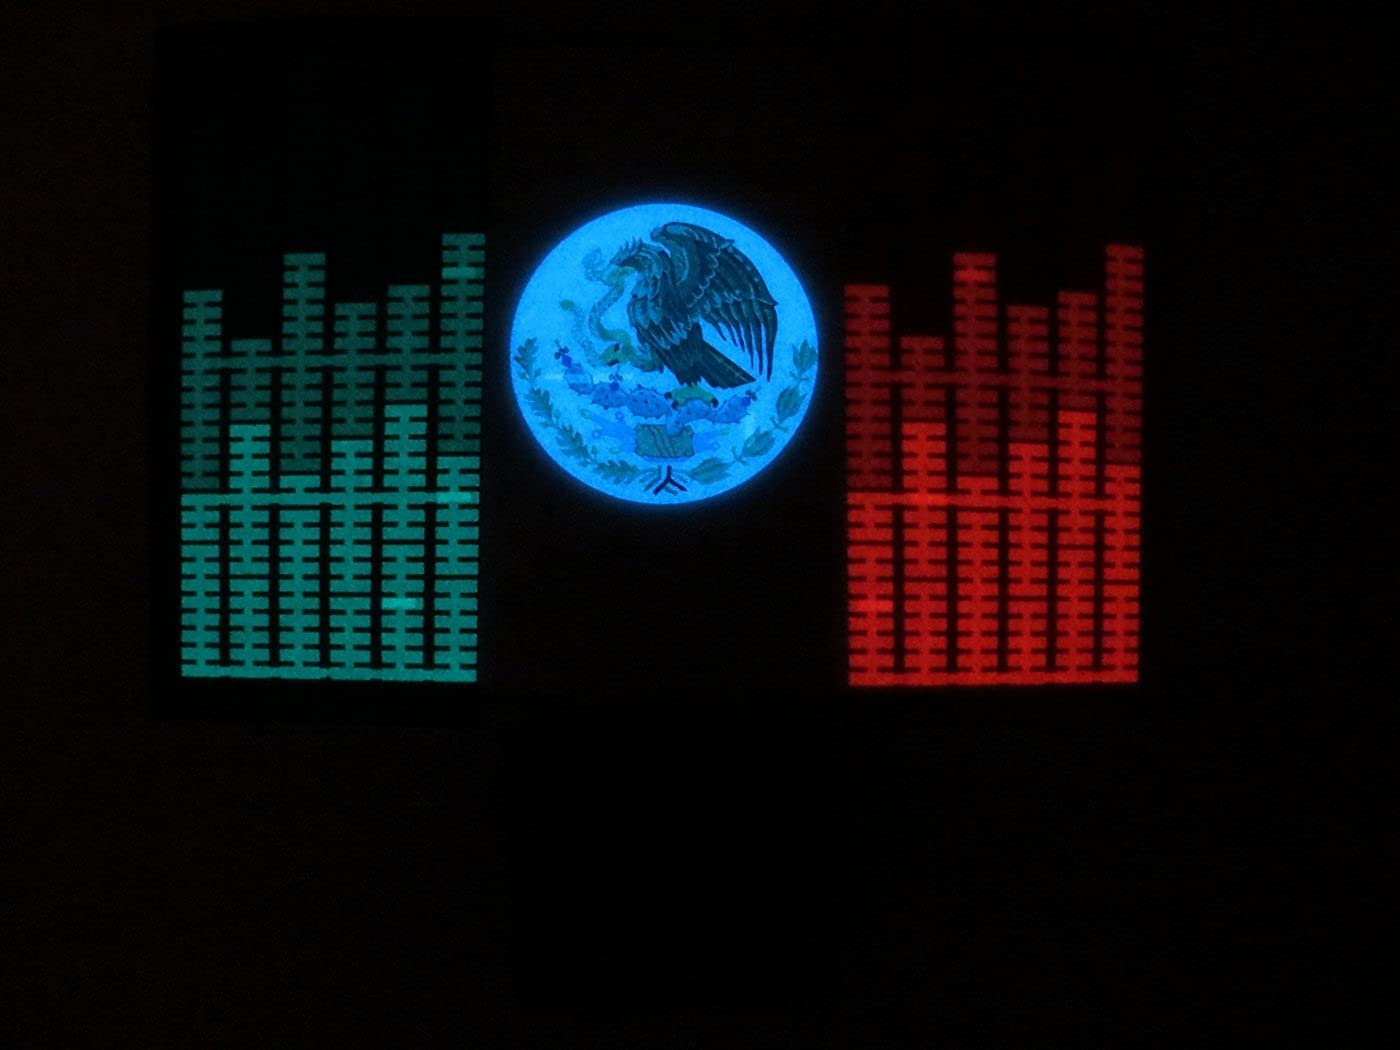 accessory 4u inc Mexico MEX Flag LED Flashing Sound Activated Light Up Shirt XXXL